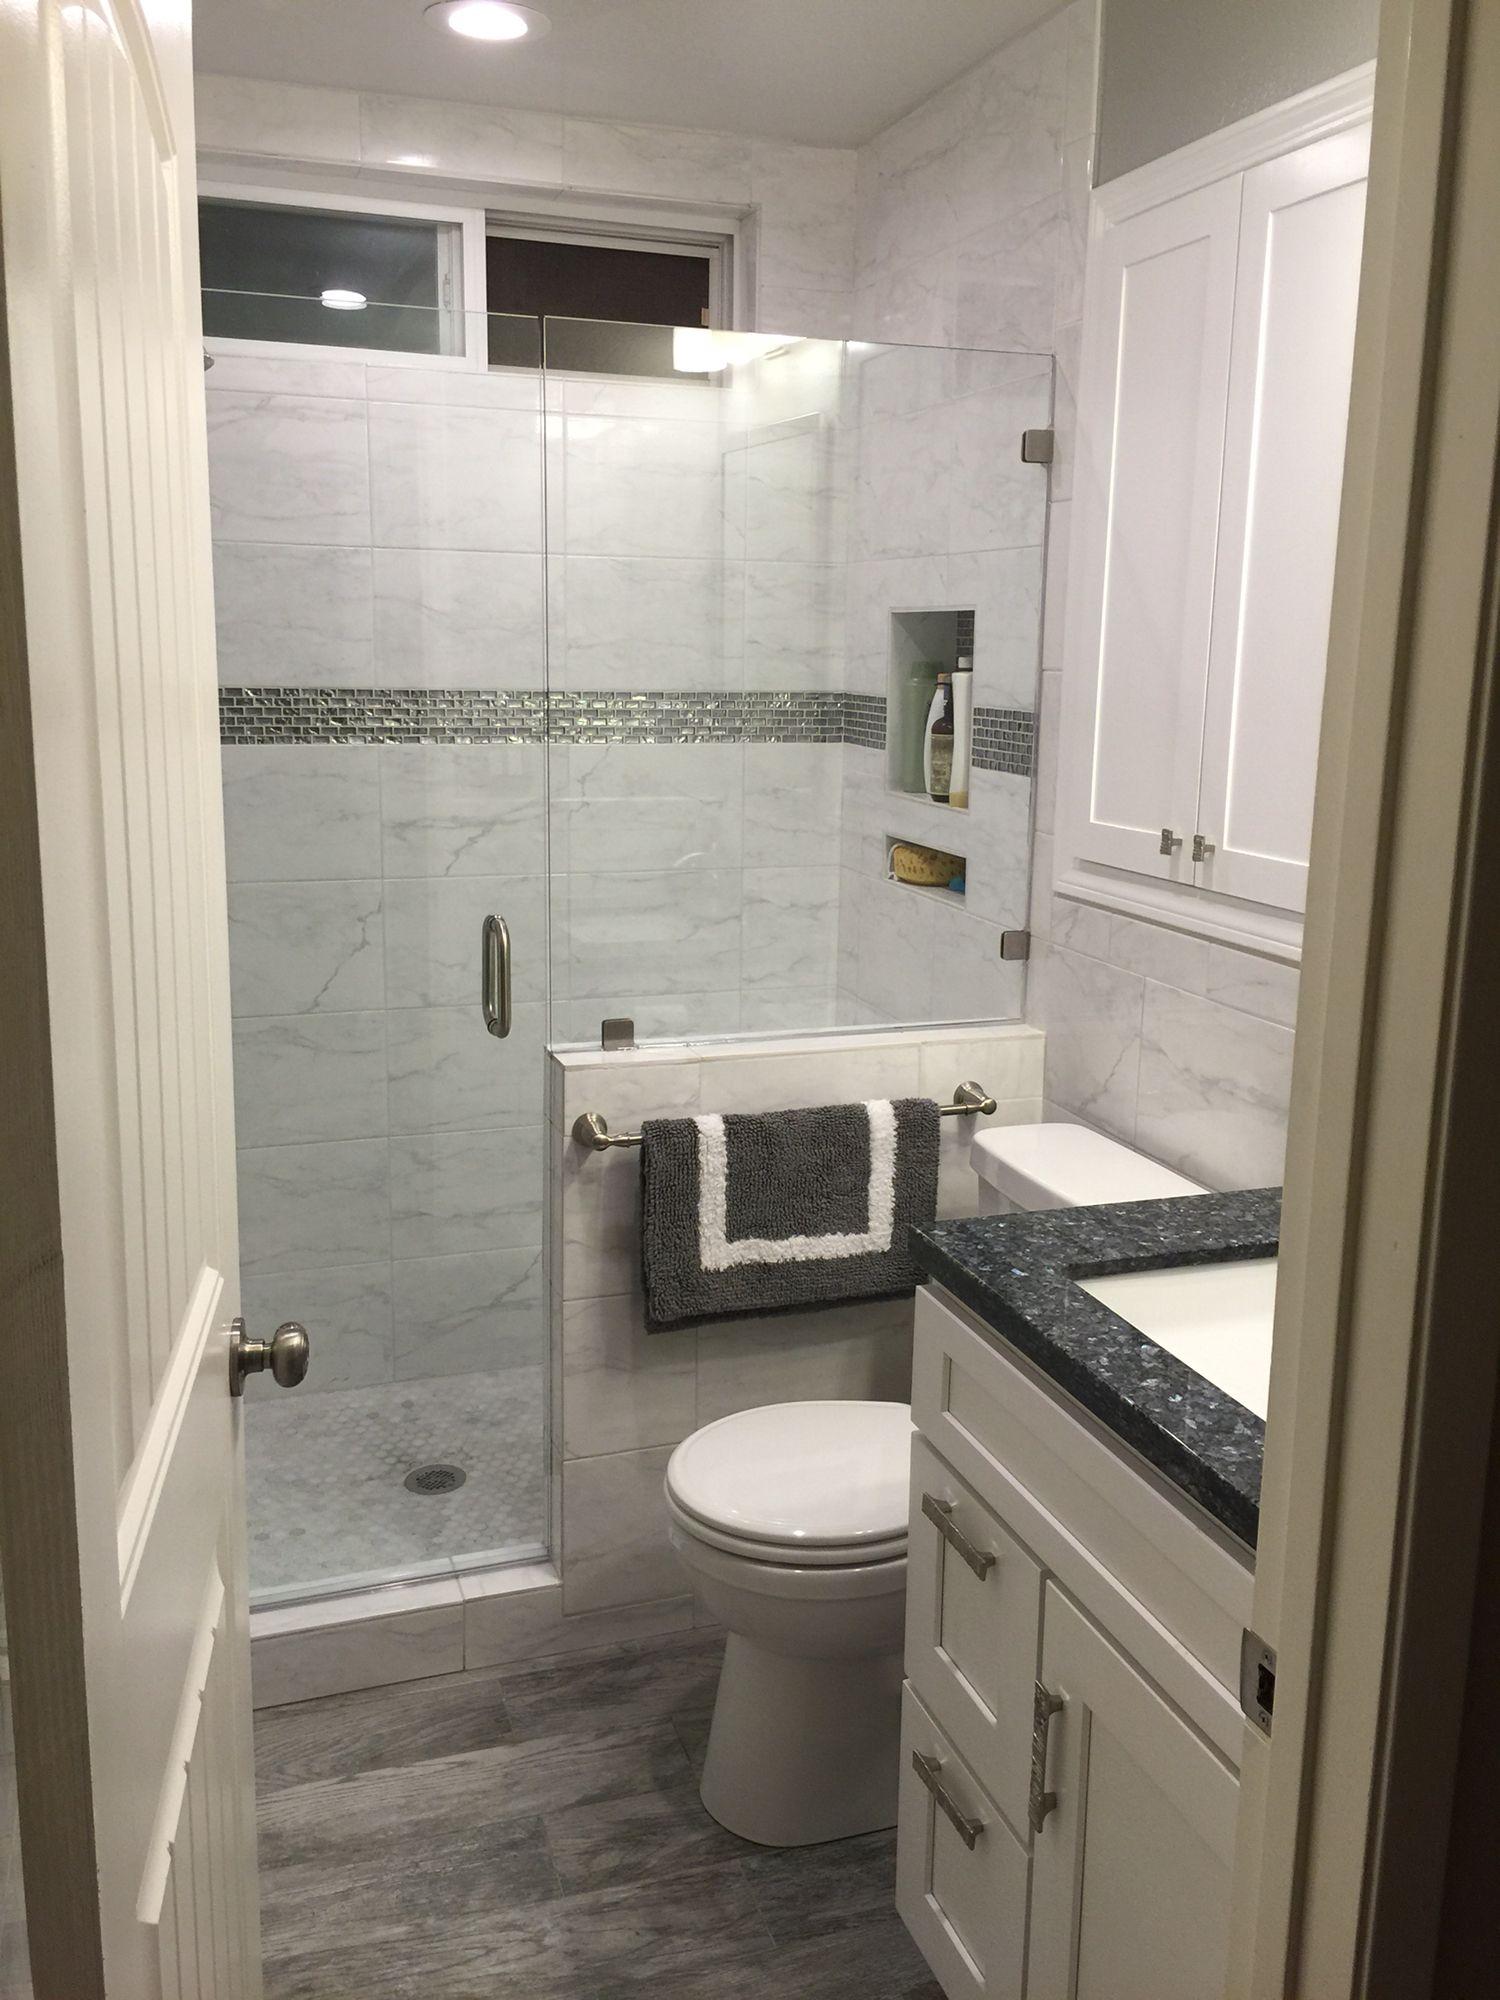 My New Bathroom Remodel Bathroom Remodel Small Budget Small Master Bathroom Bathrooms Remodel